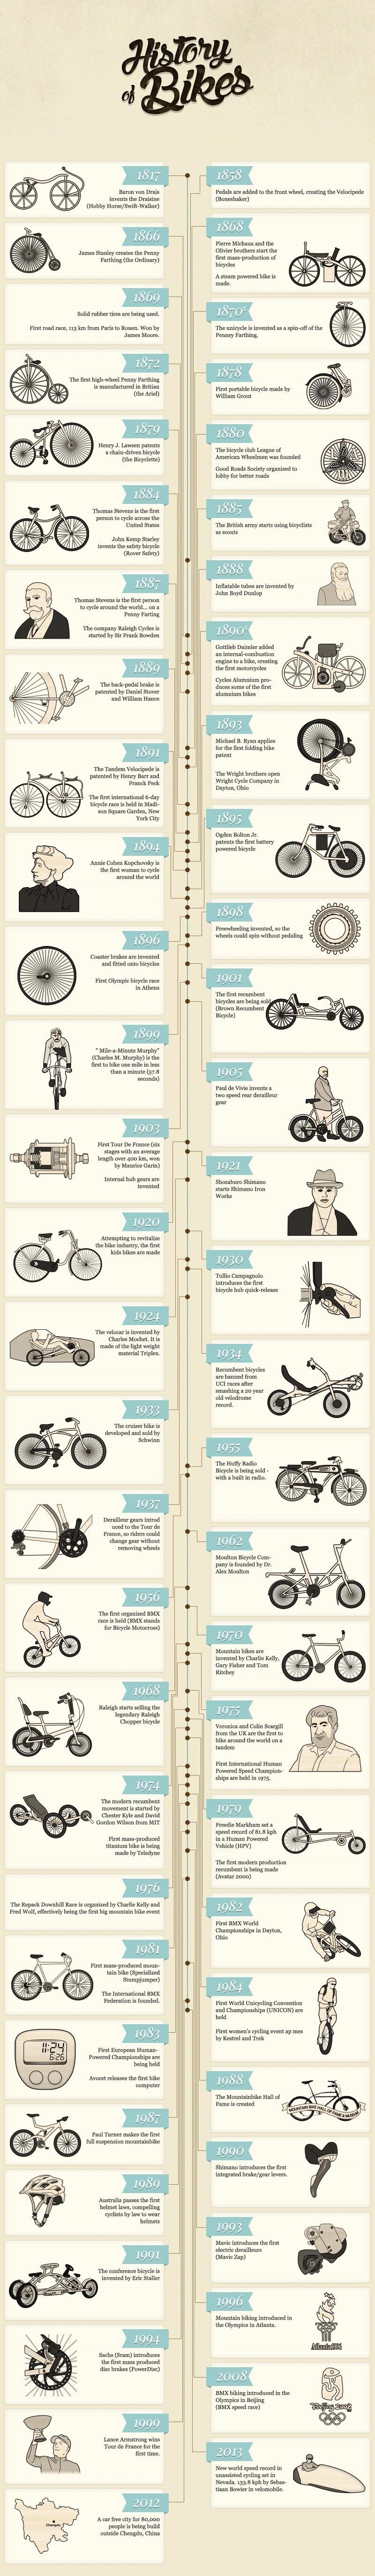 bike-history